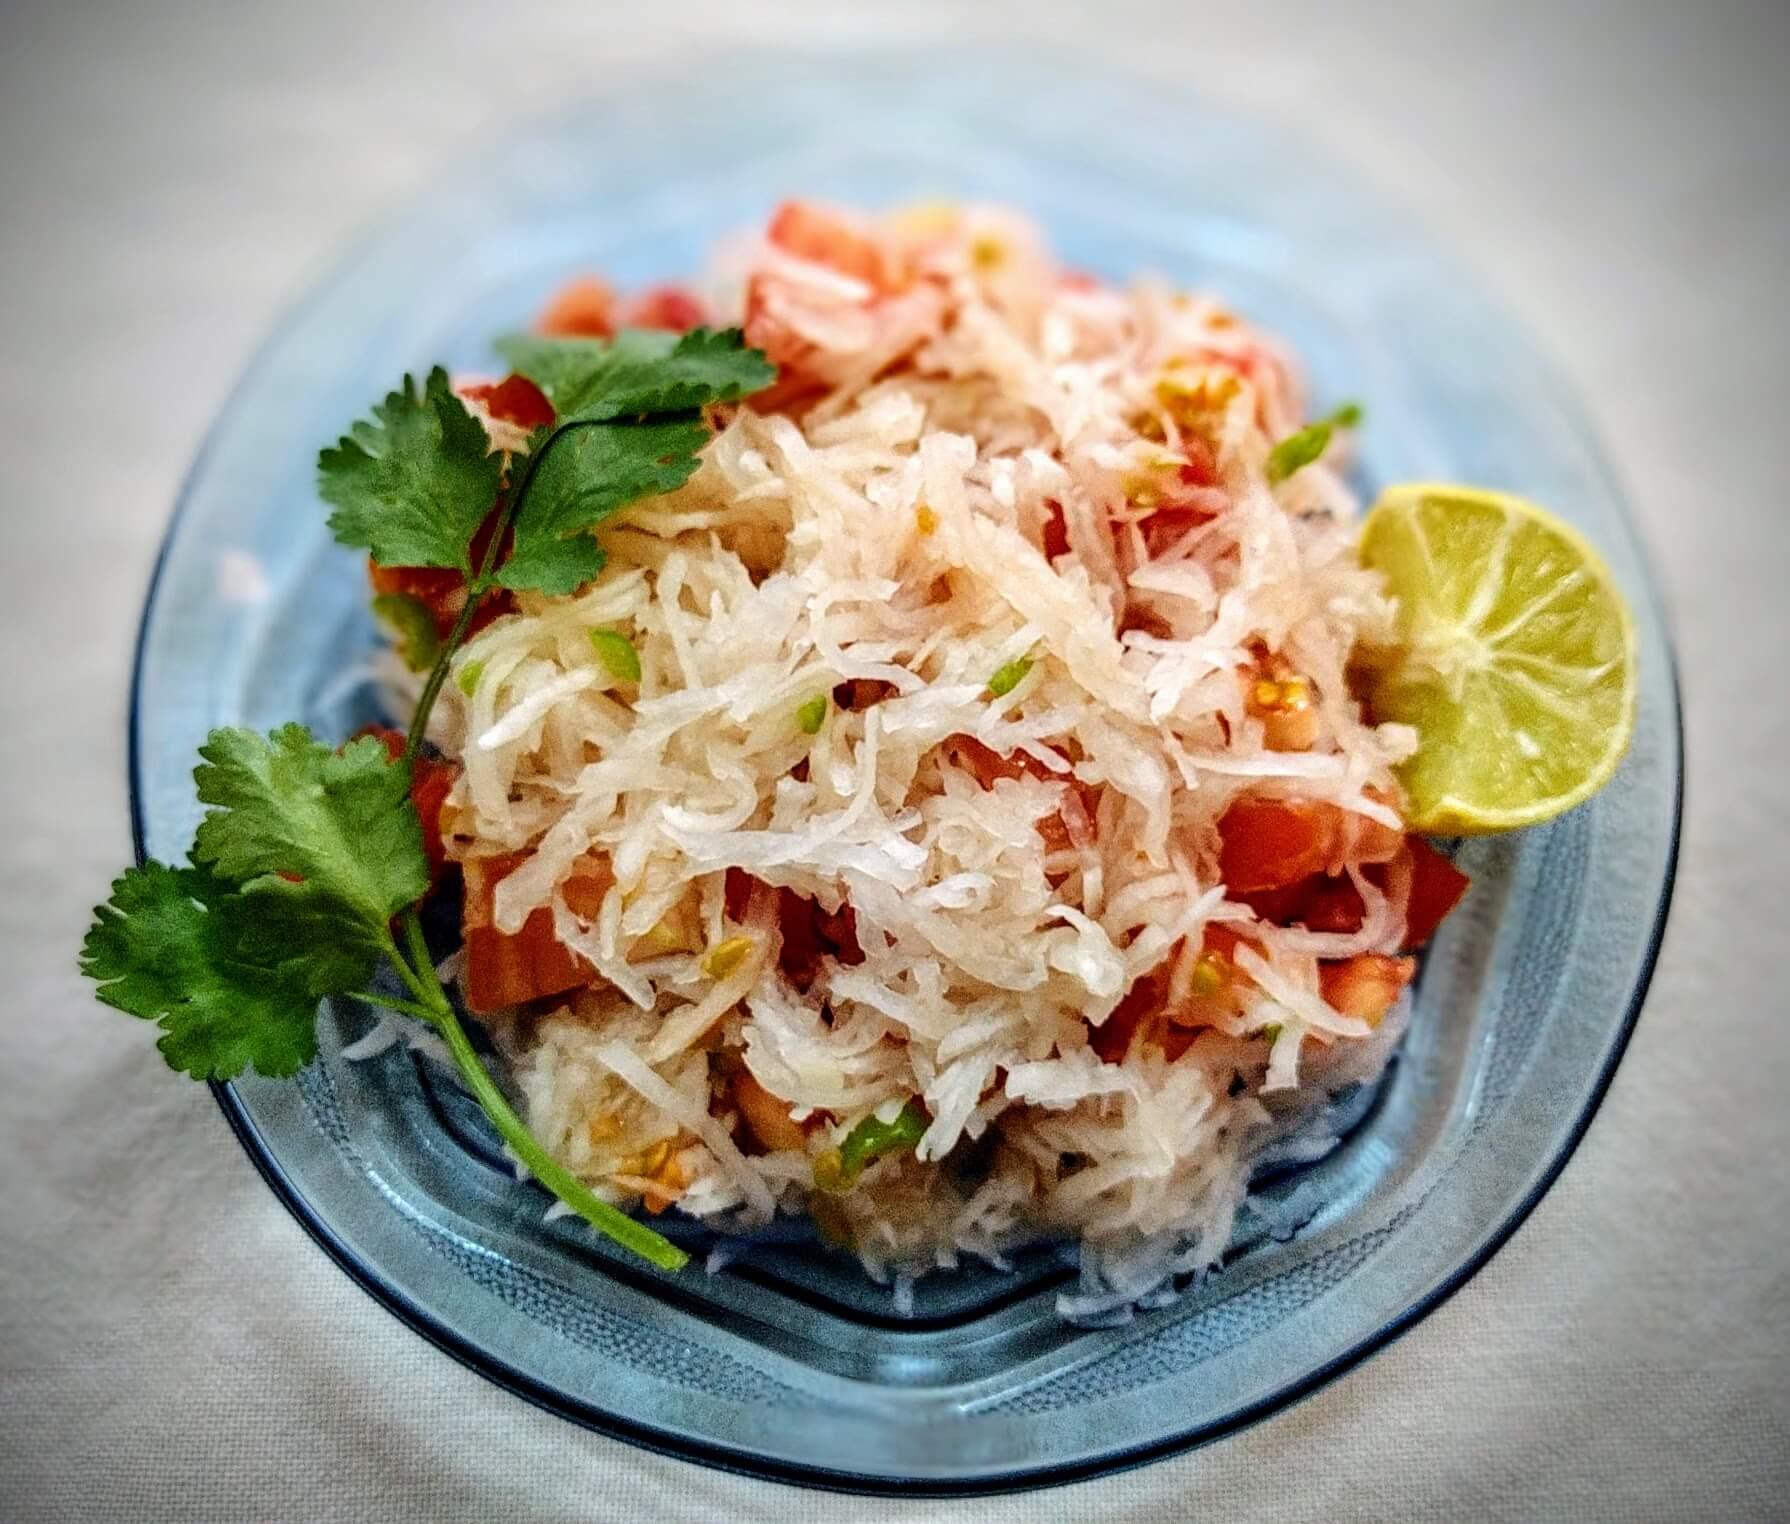 mooli recipe salad with chicken